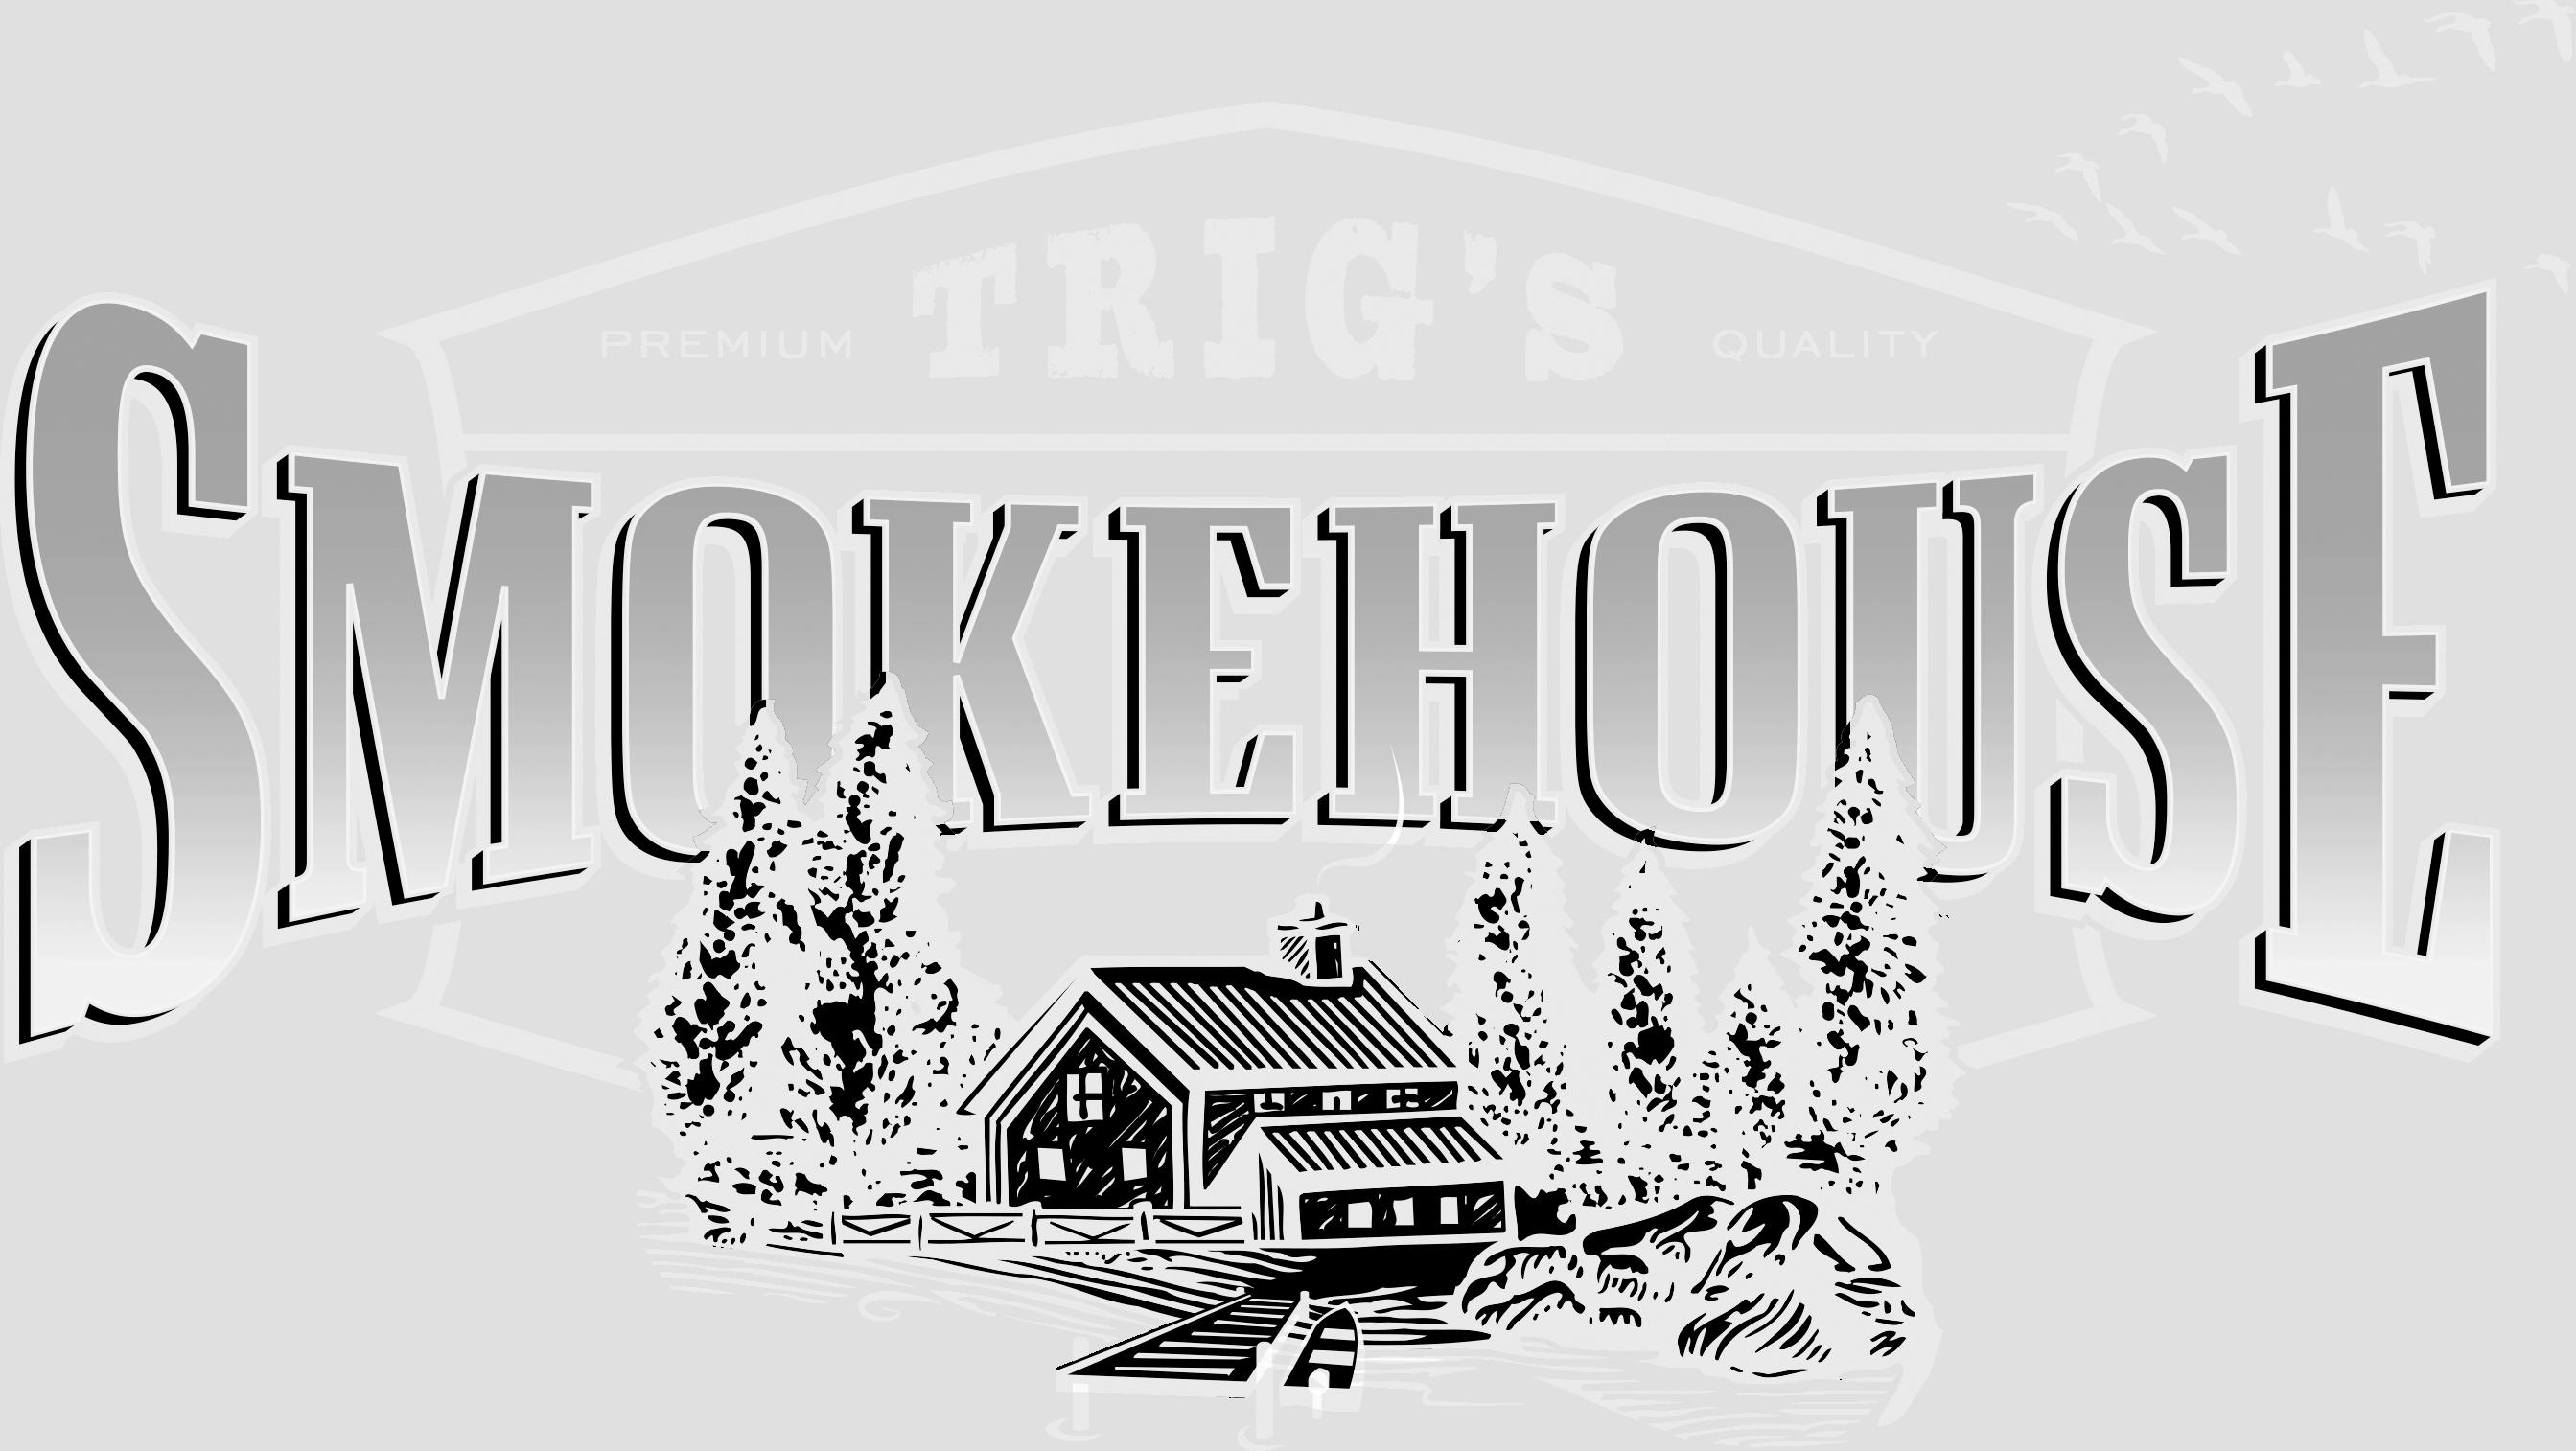 Trig's Smokehouse